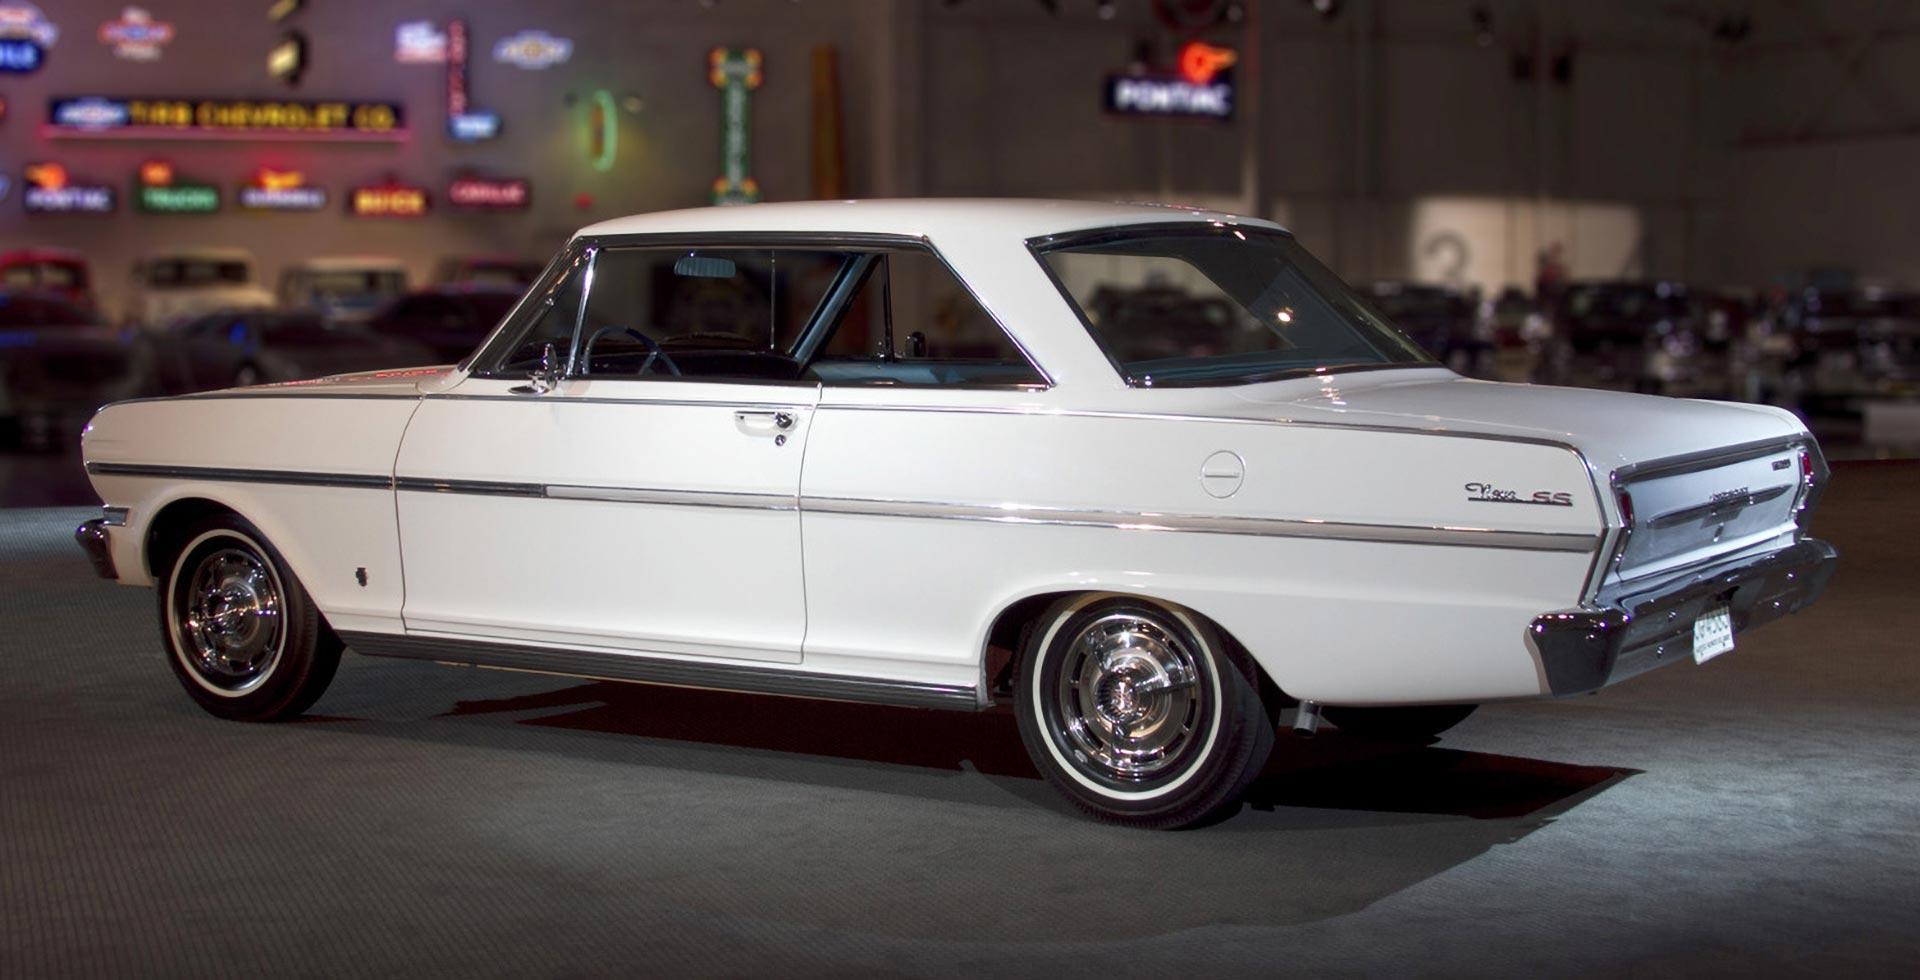 1963 Chevy Nova at a car show